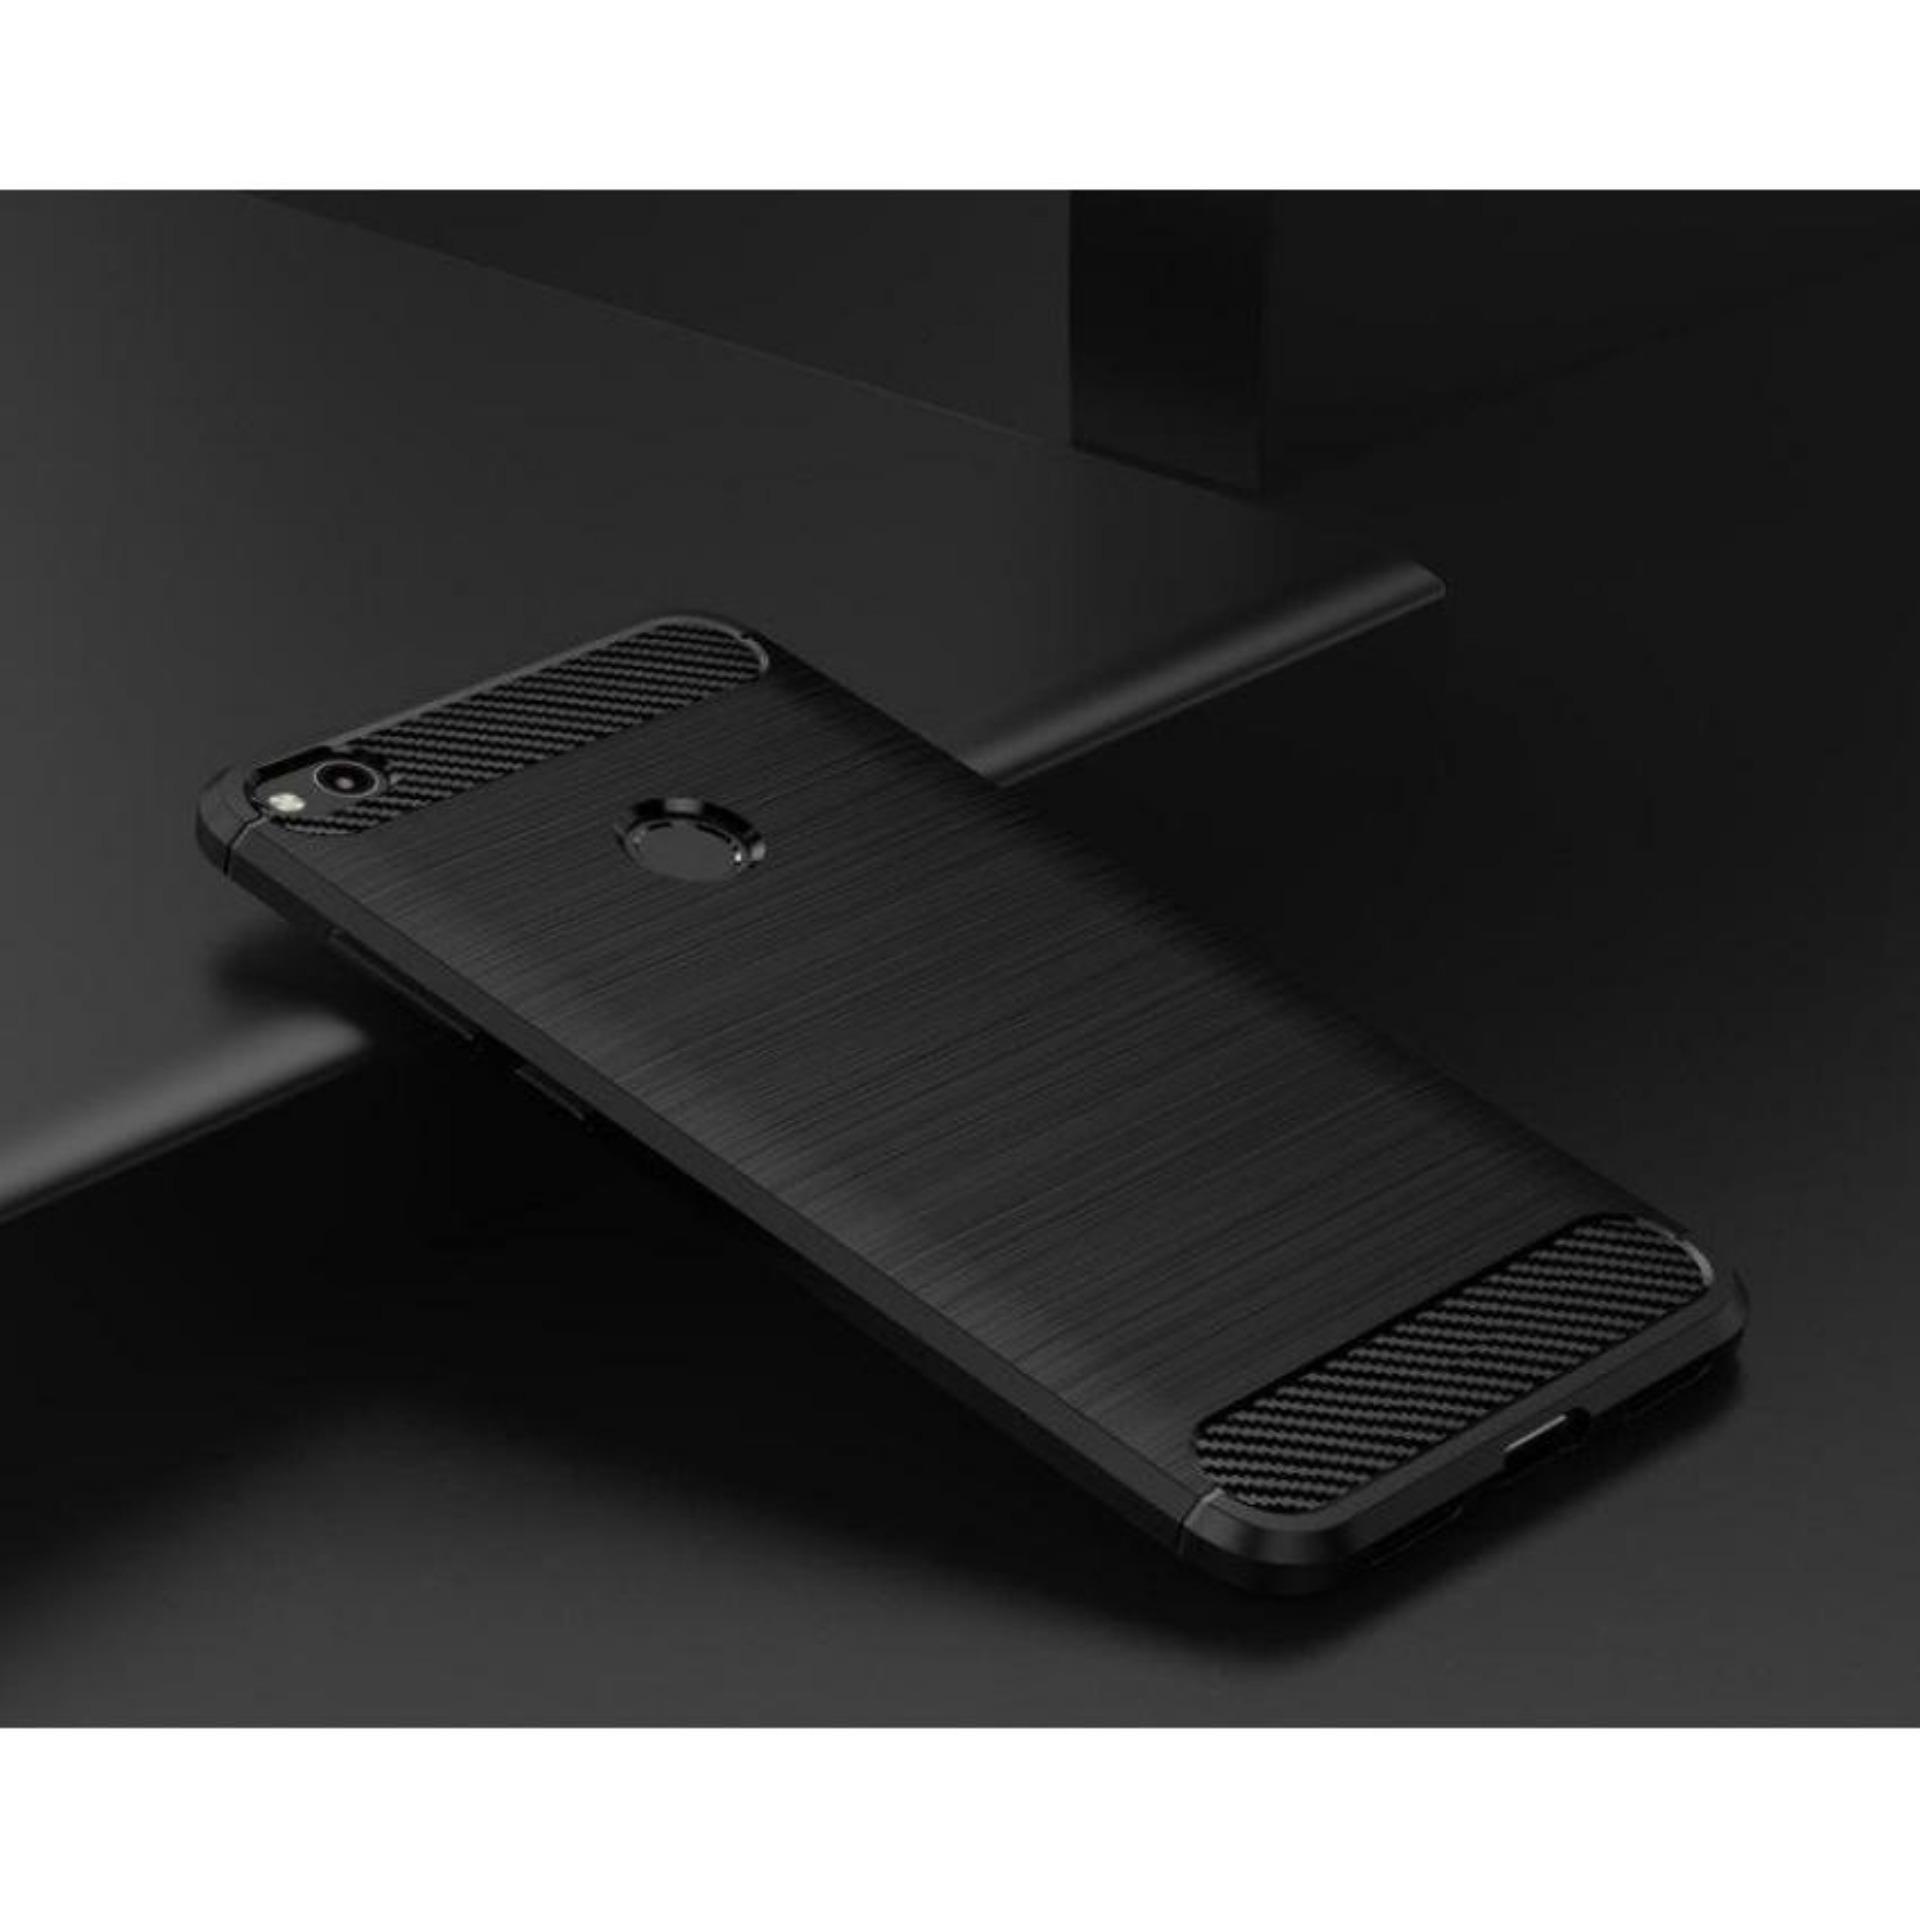 ... original ipaky shockproof hybrid back case for xiaomi redmi 4x ...